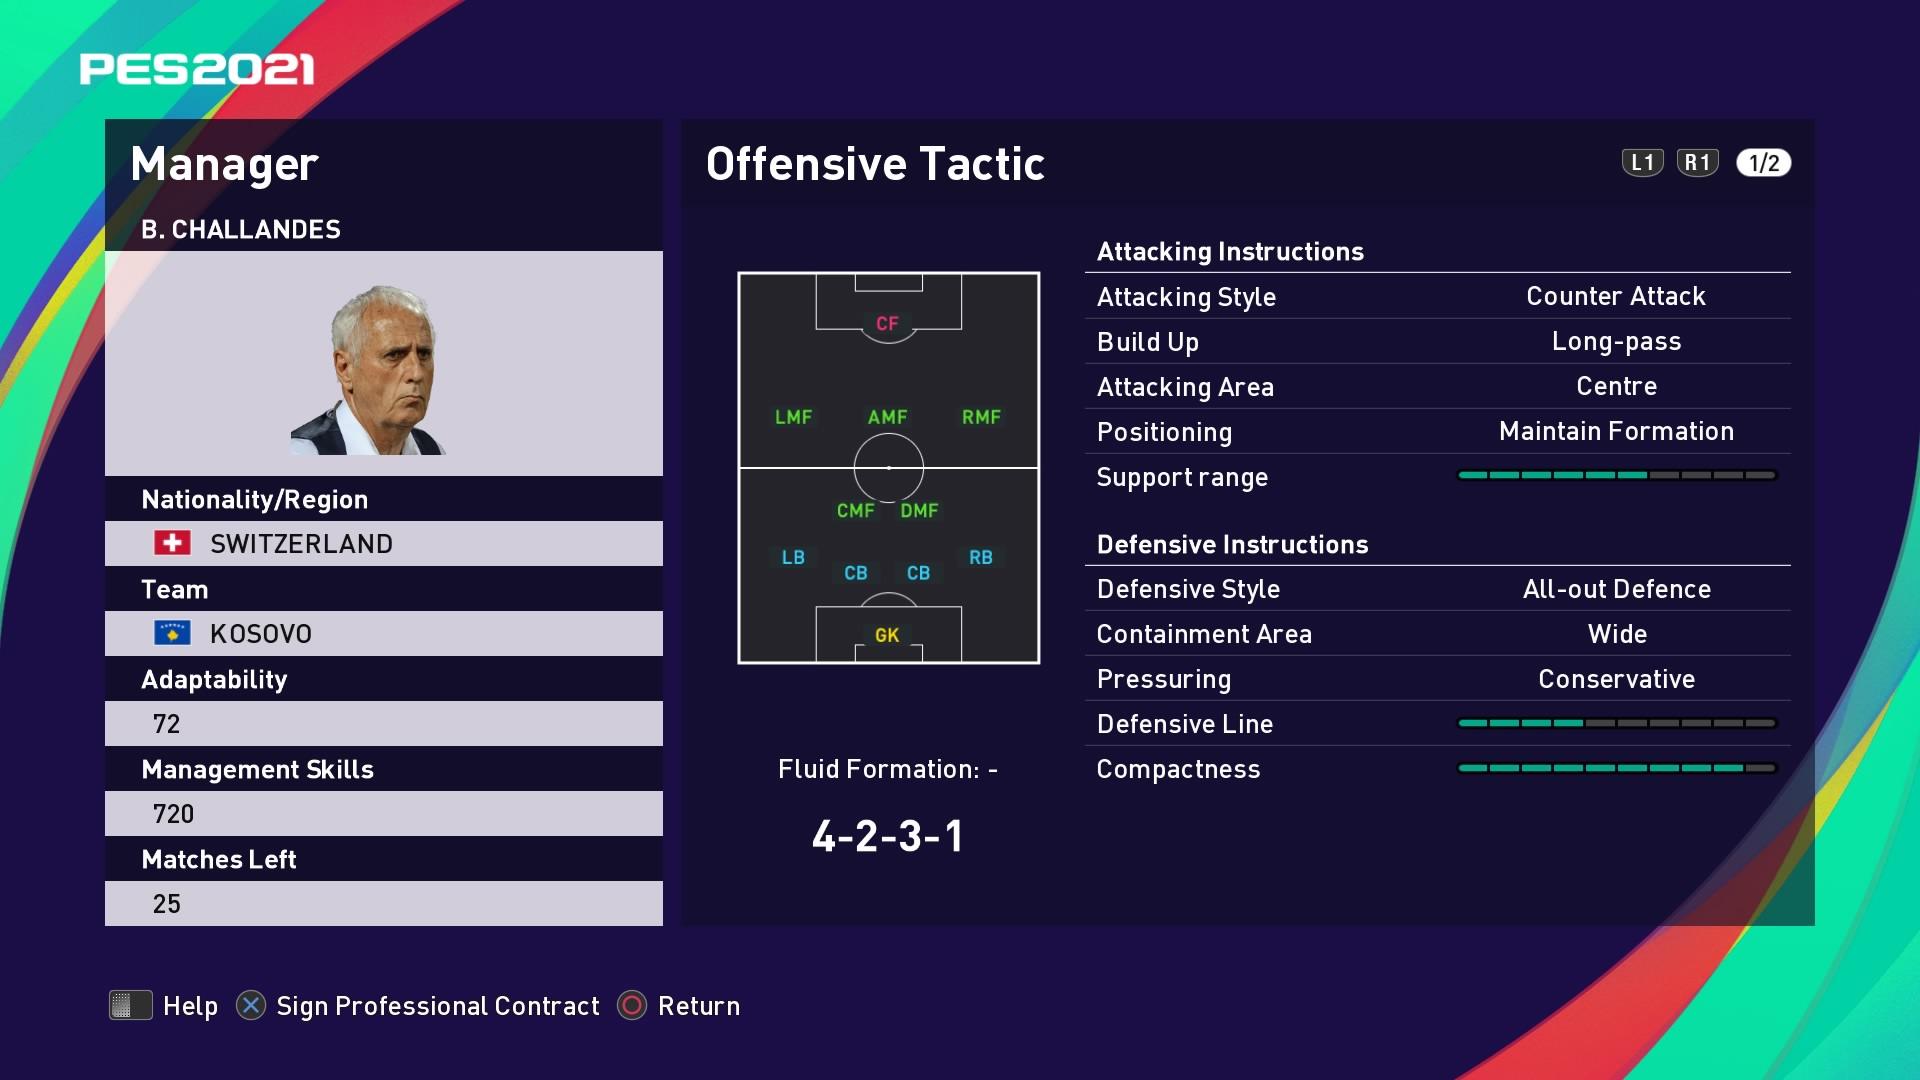 B. Challandes (Bernard Challandes) Offensive Tactic in PES 2021 myClub